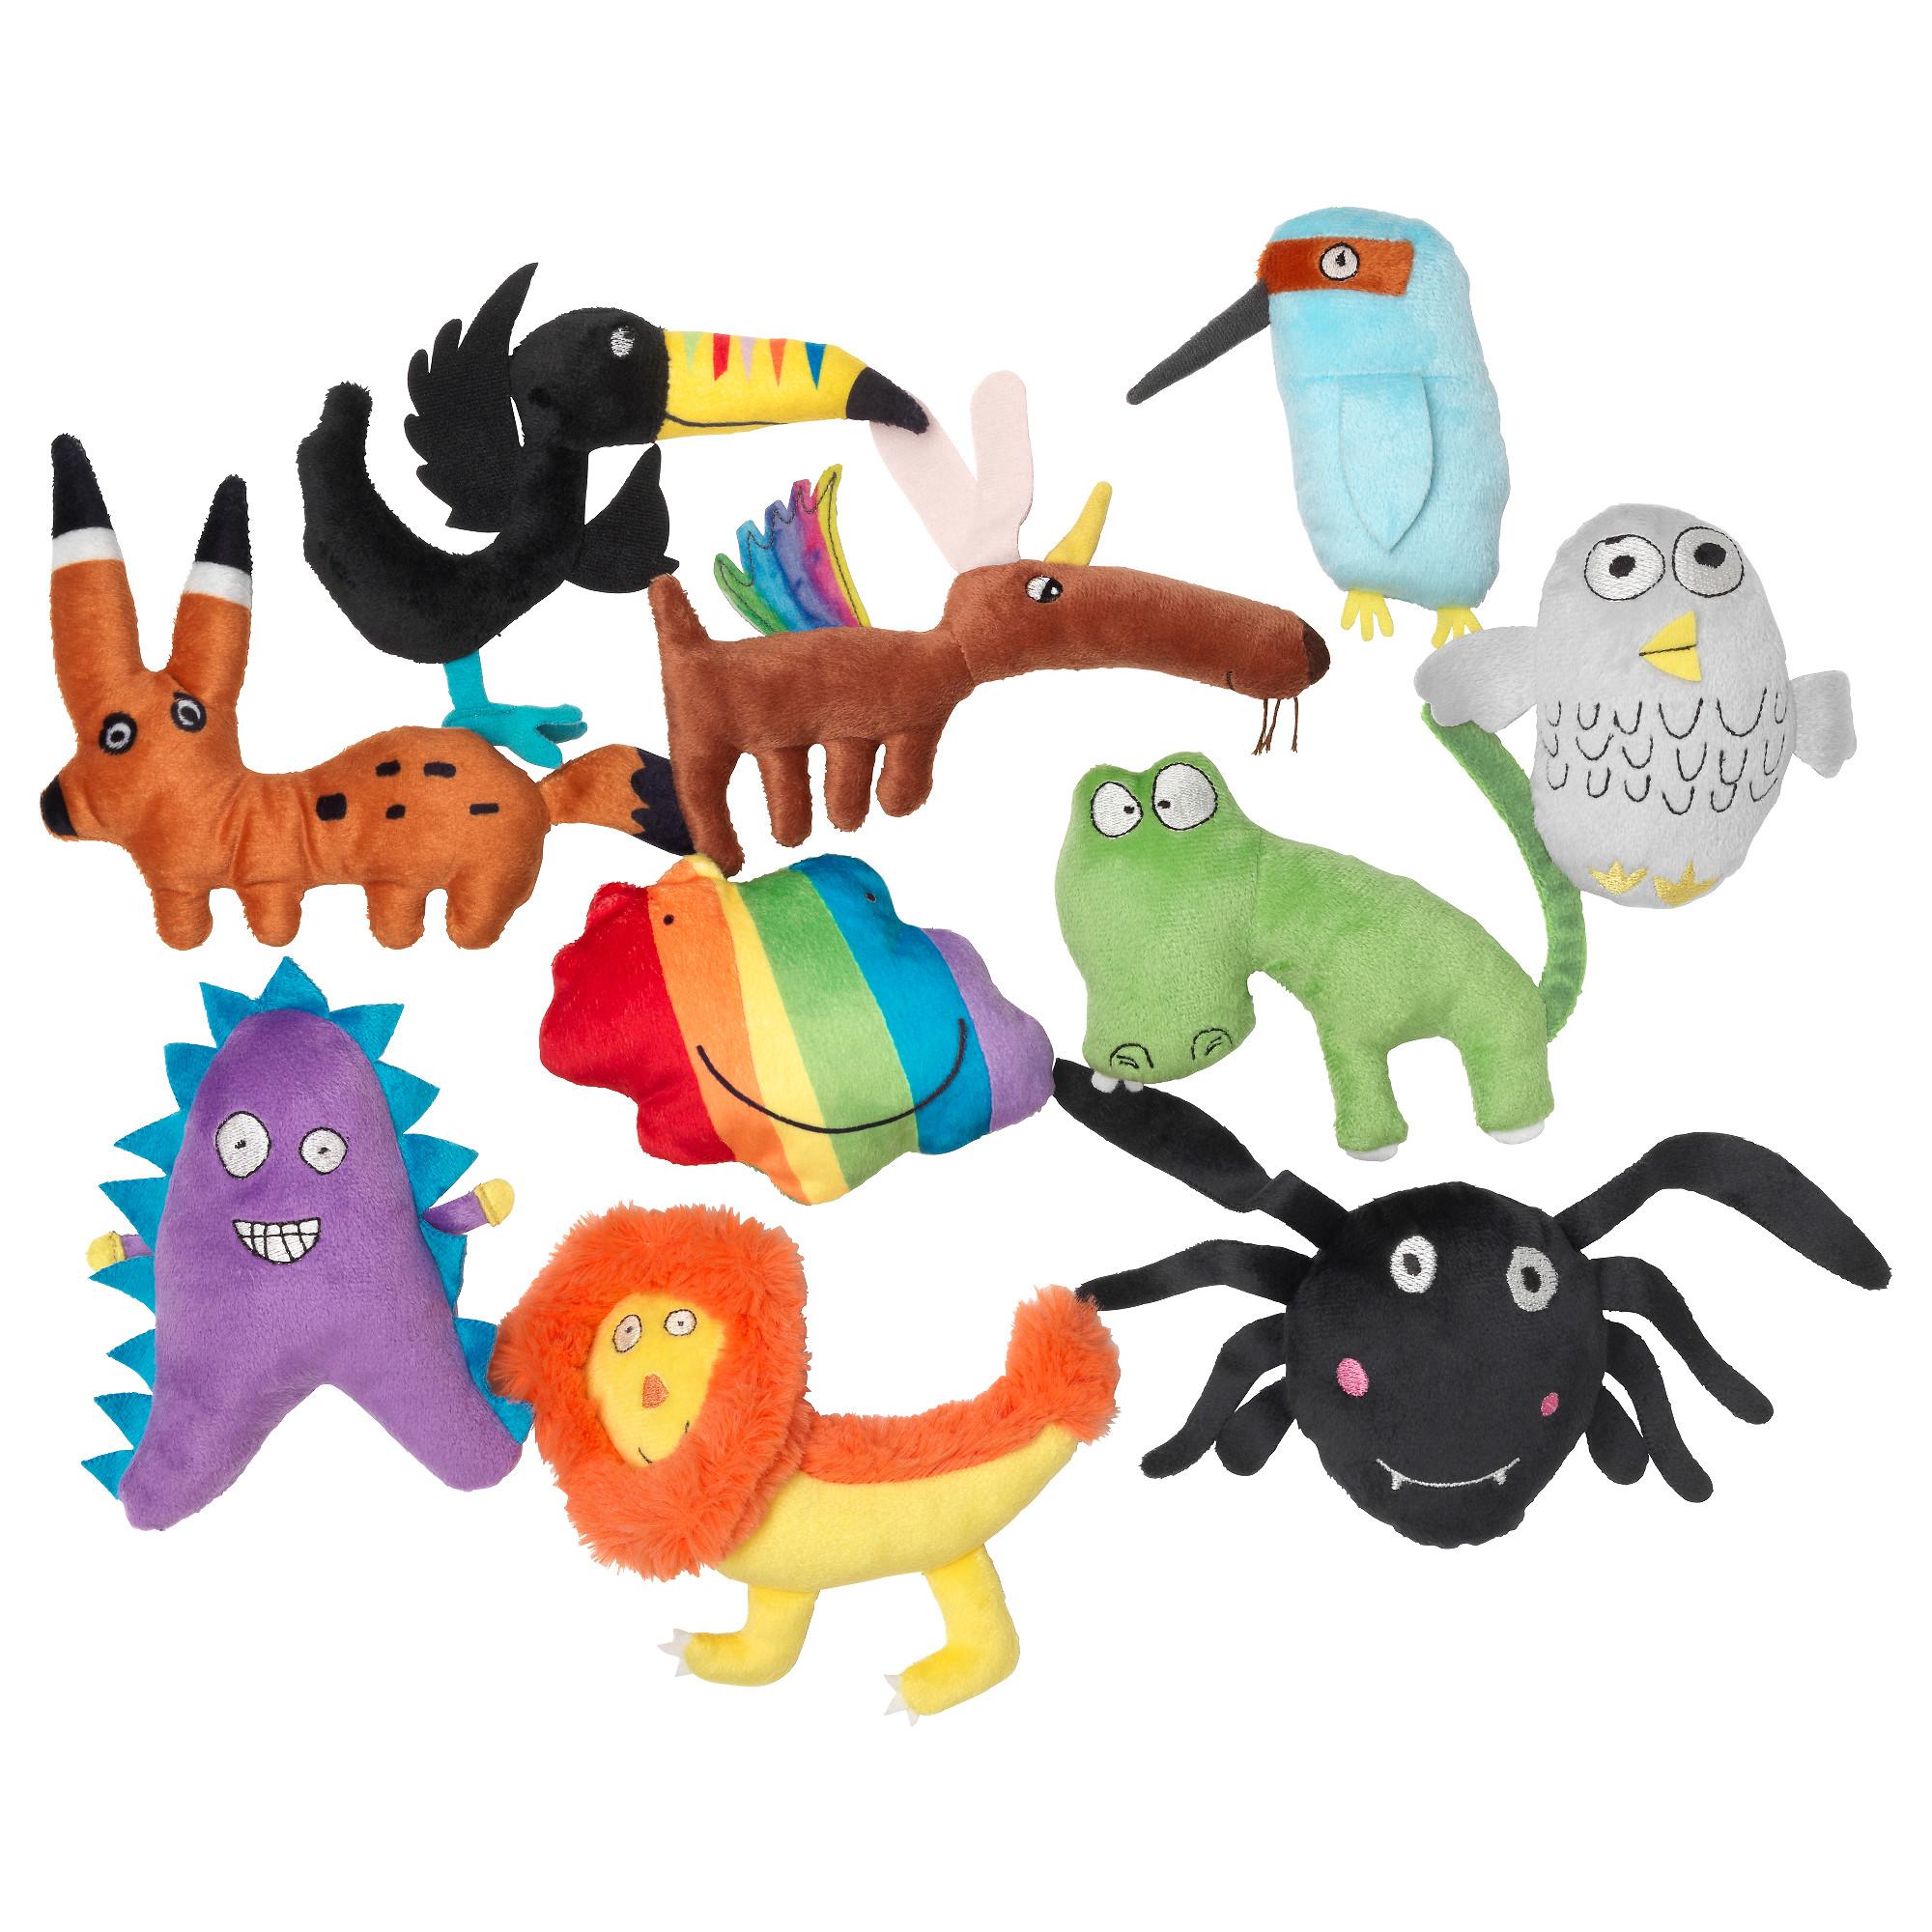 2000x2000 Children's Toys Wooden Toys Ikea